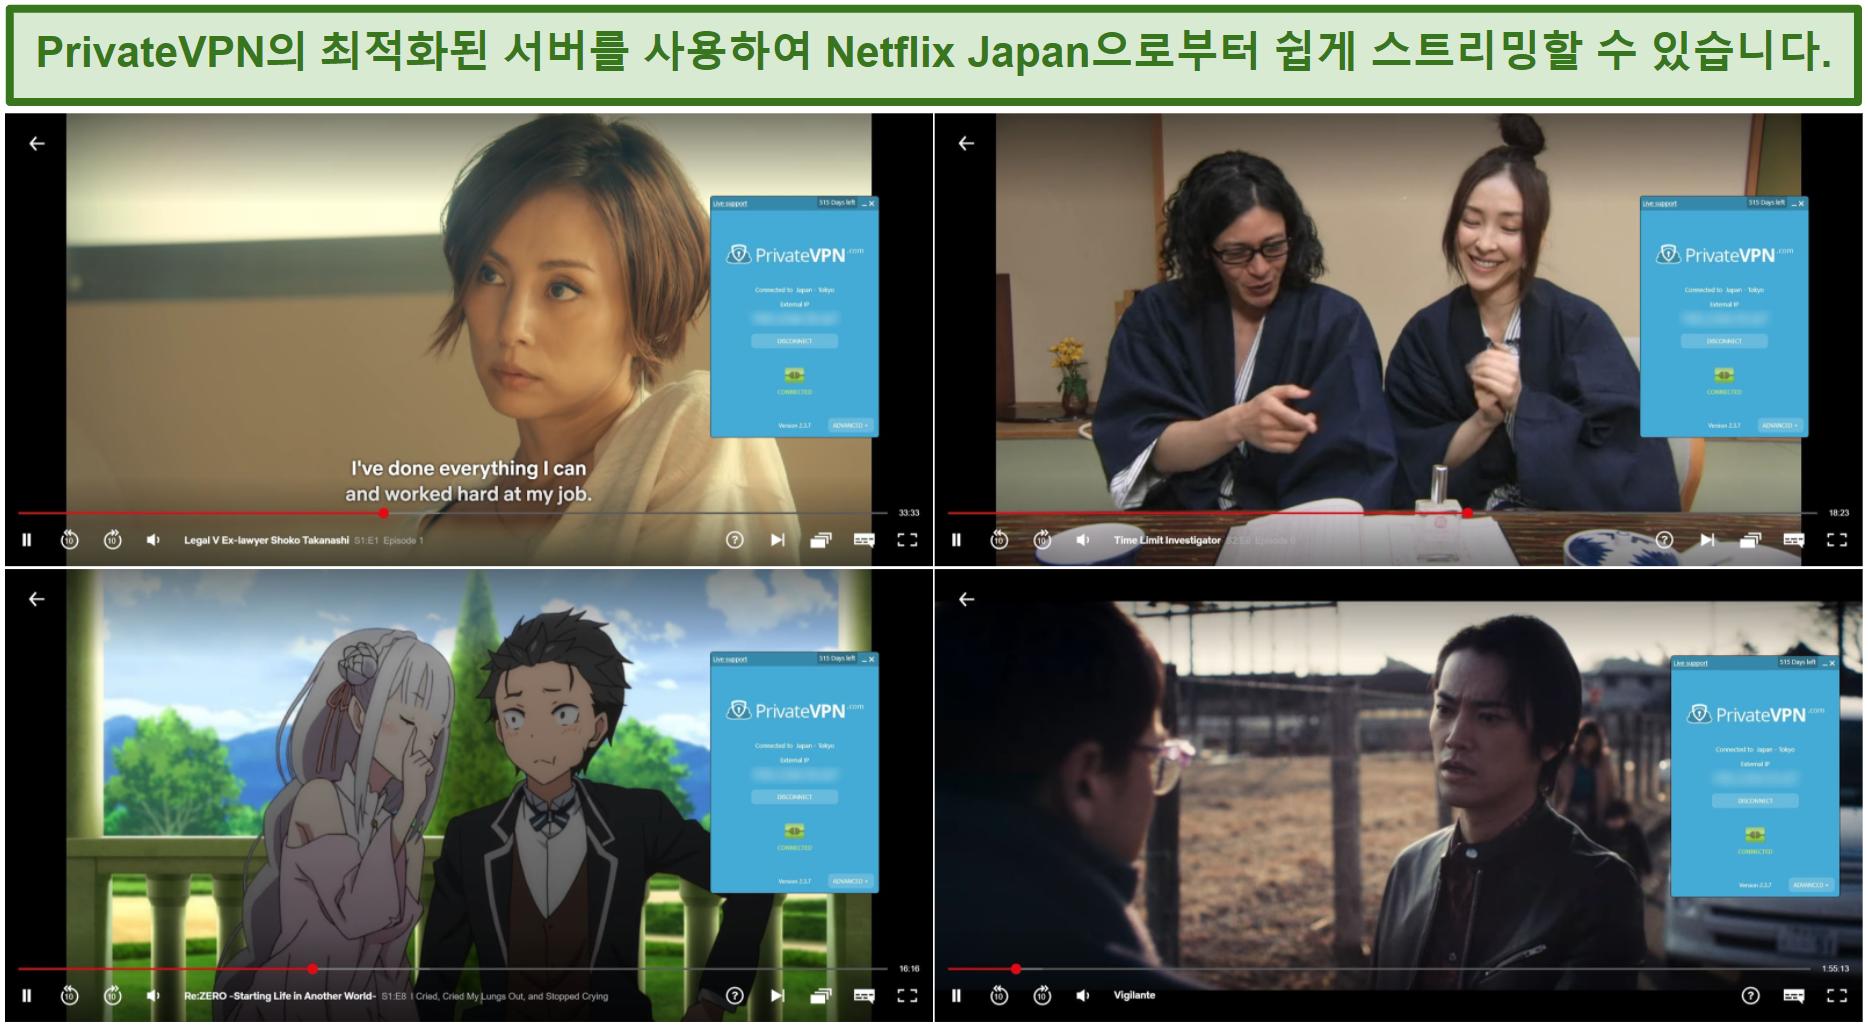 PrivateVPN 차단 해제 Legal V 전 변호사 Shoko Takanashi, 시간 제한 수사관, Re : ZERO-다른 세상에서의 삶 시작, Netflix Japan의 Vigilante